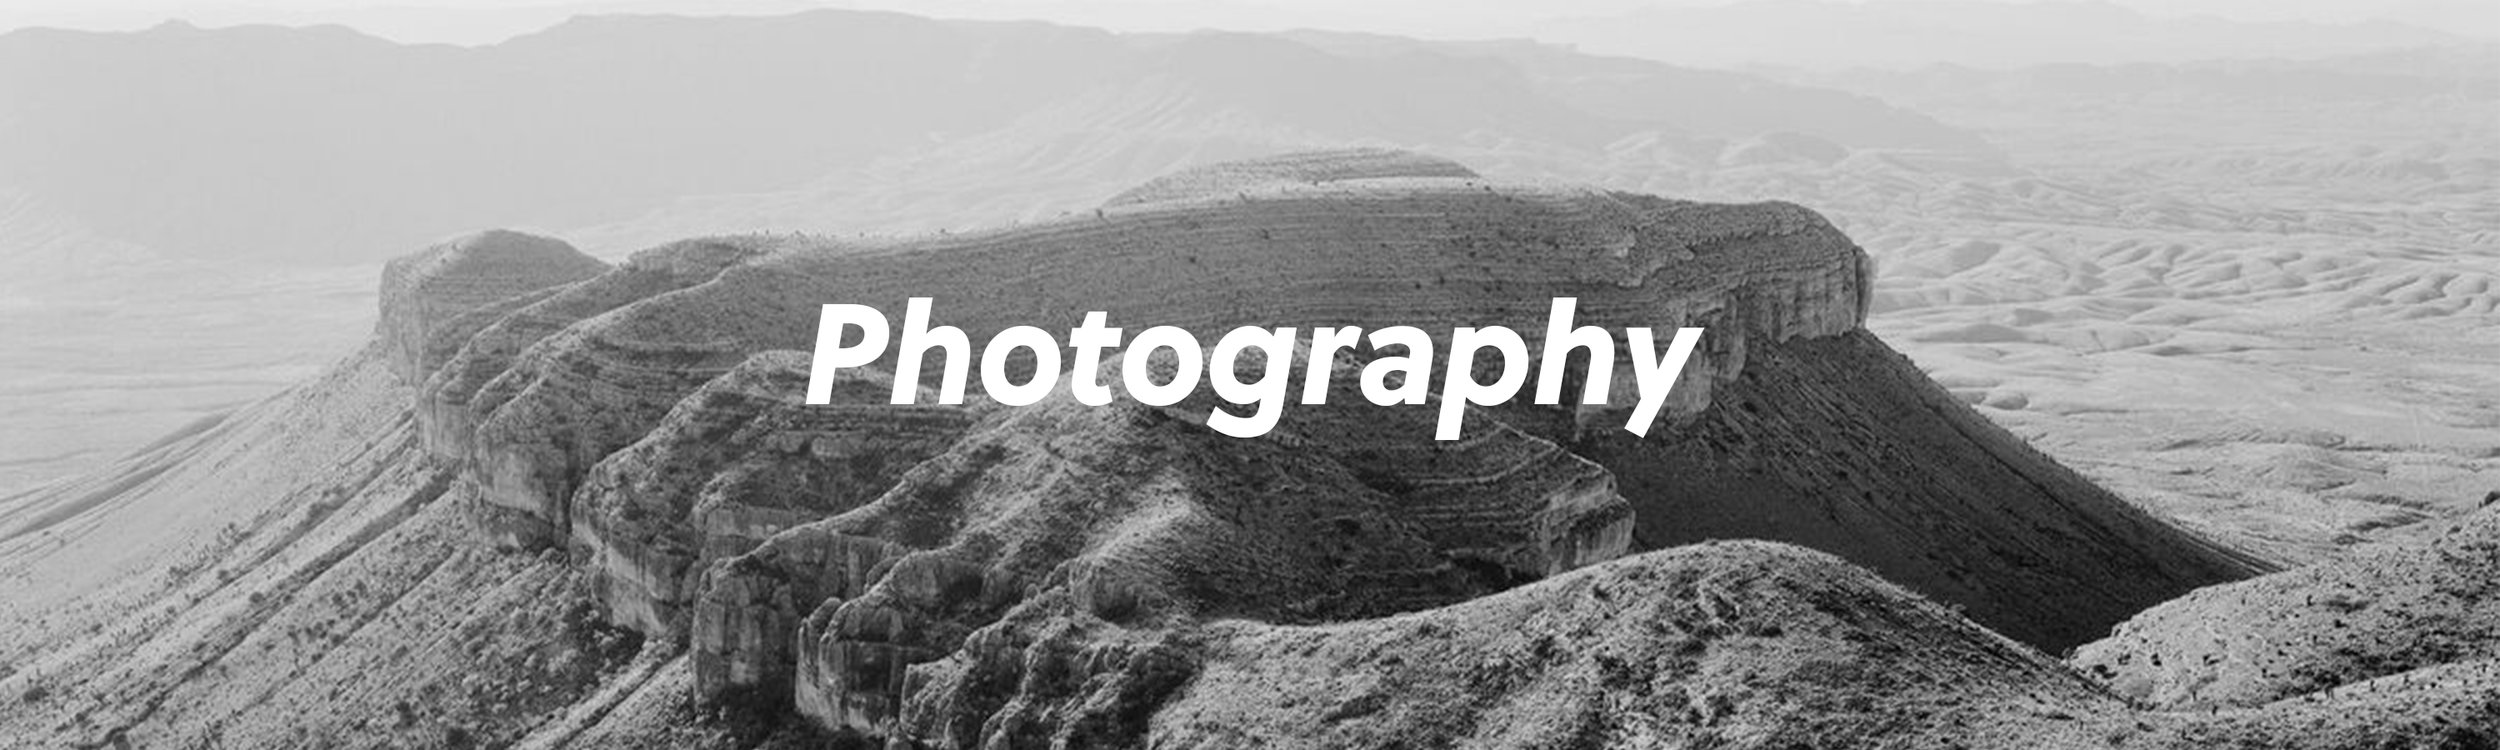 photography banner.jpg